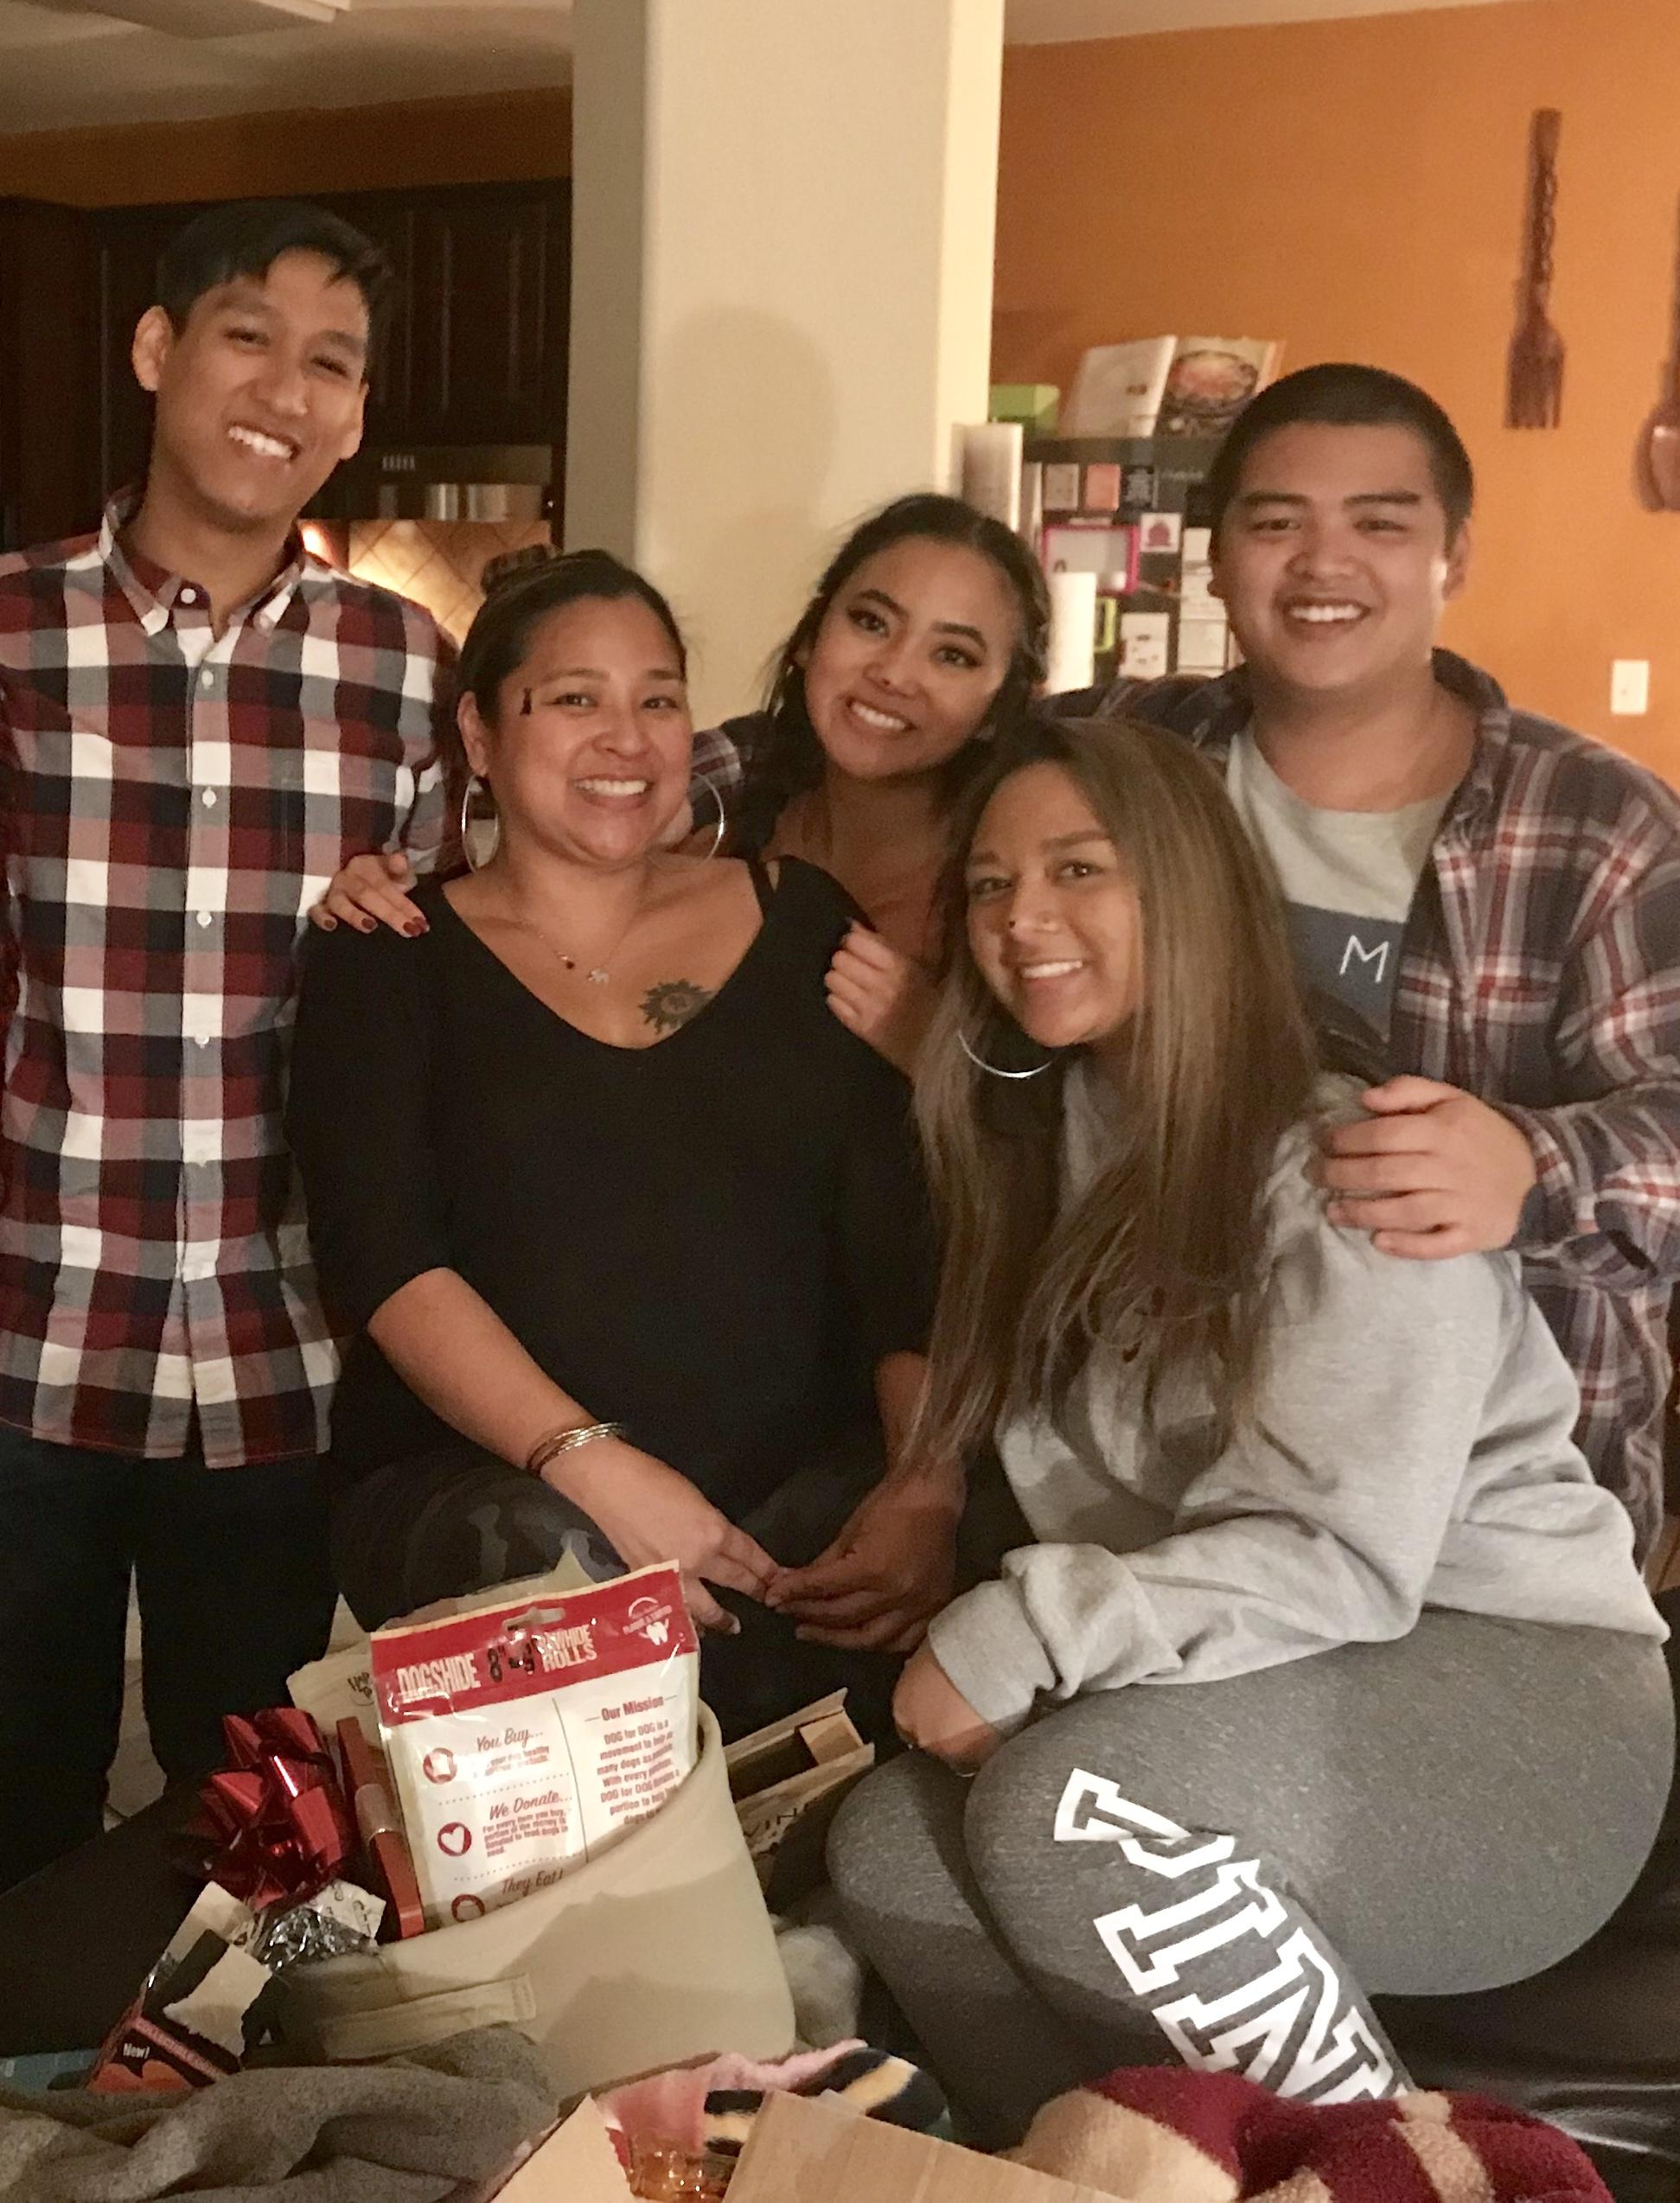 Angela Alvarado the single parent's anthem | maria's random rants